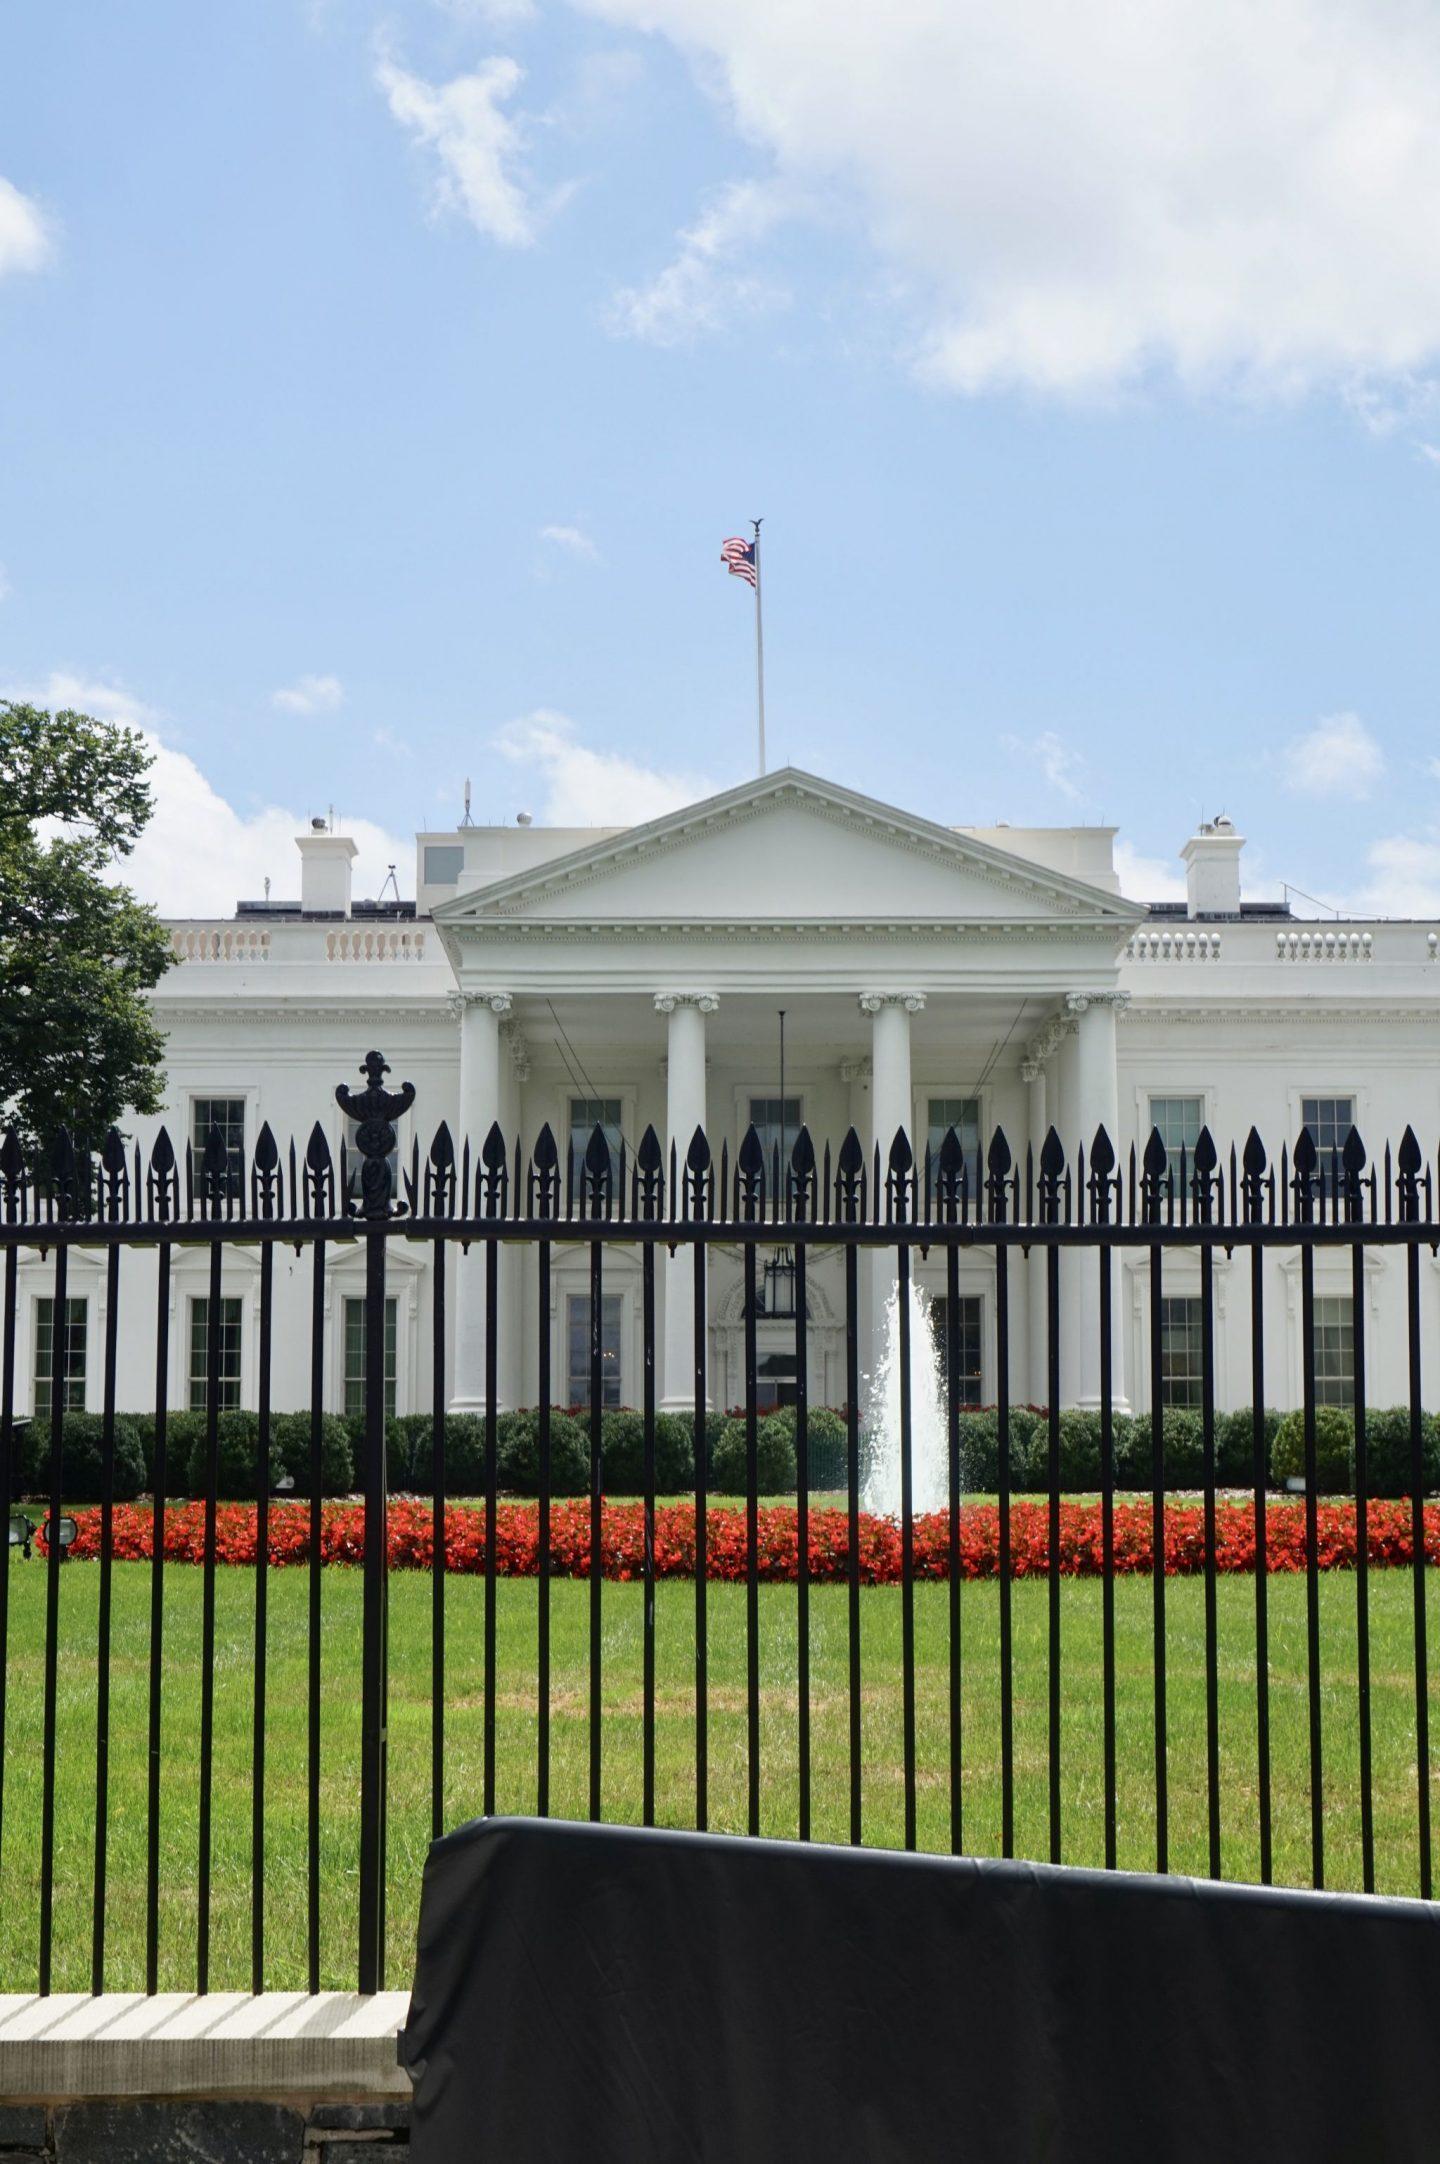 visit the white house in washington dc